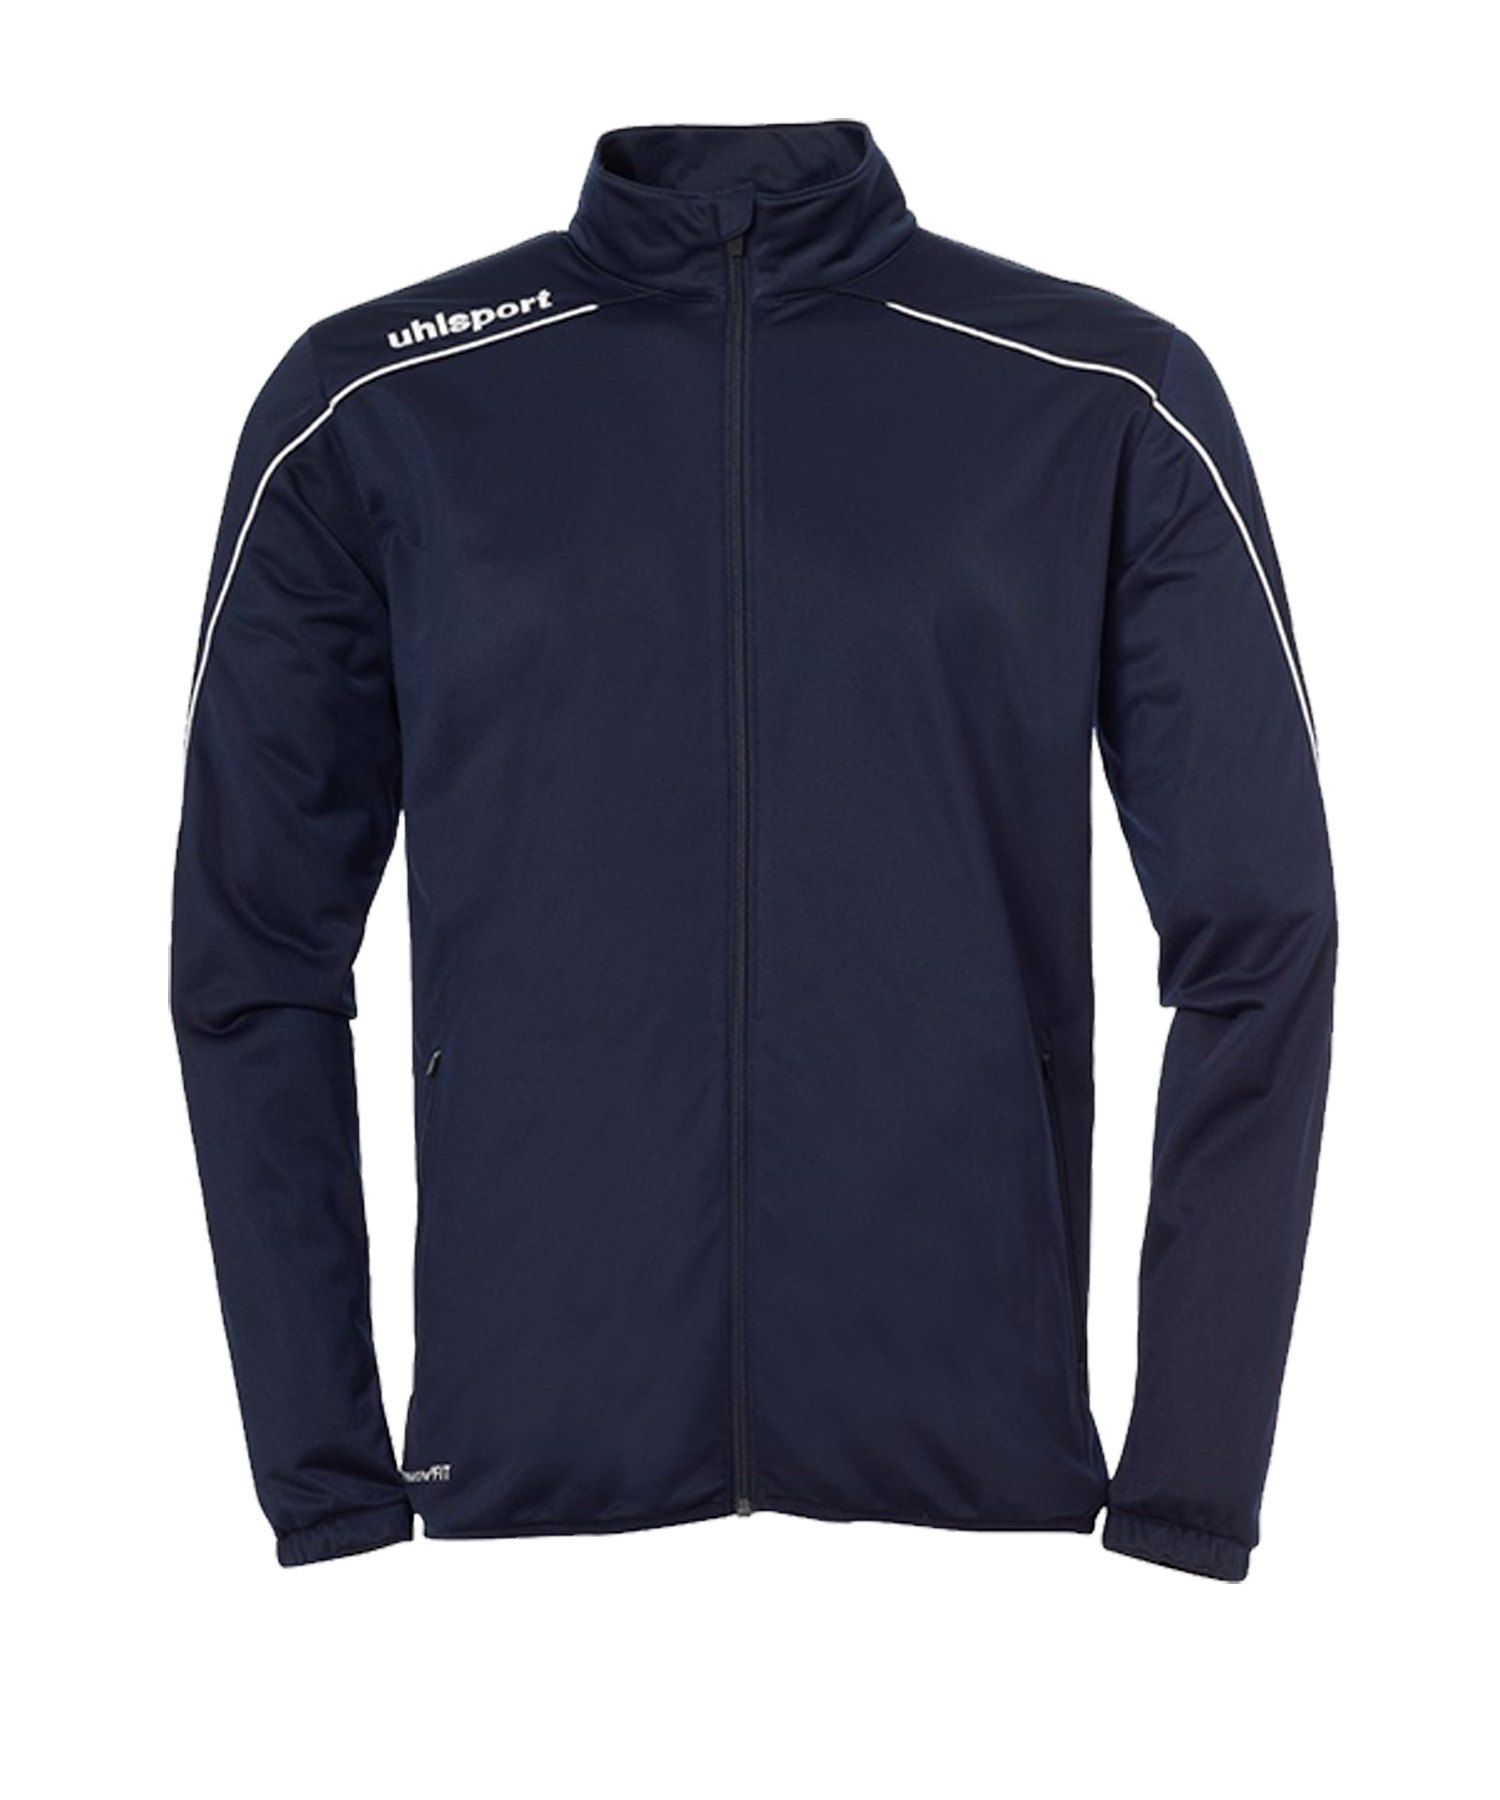 Uhlsport Stream 22 Trainingsjacke Classic Blau F12 - Blau